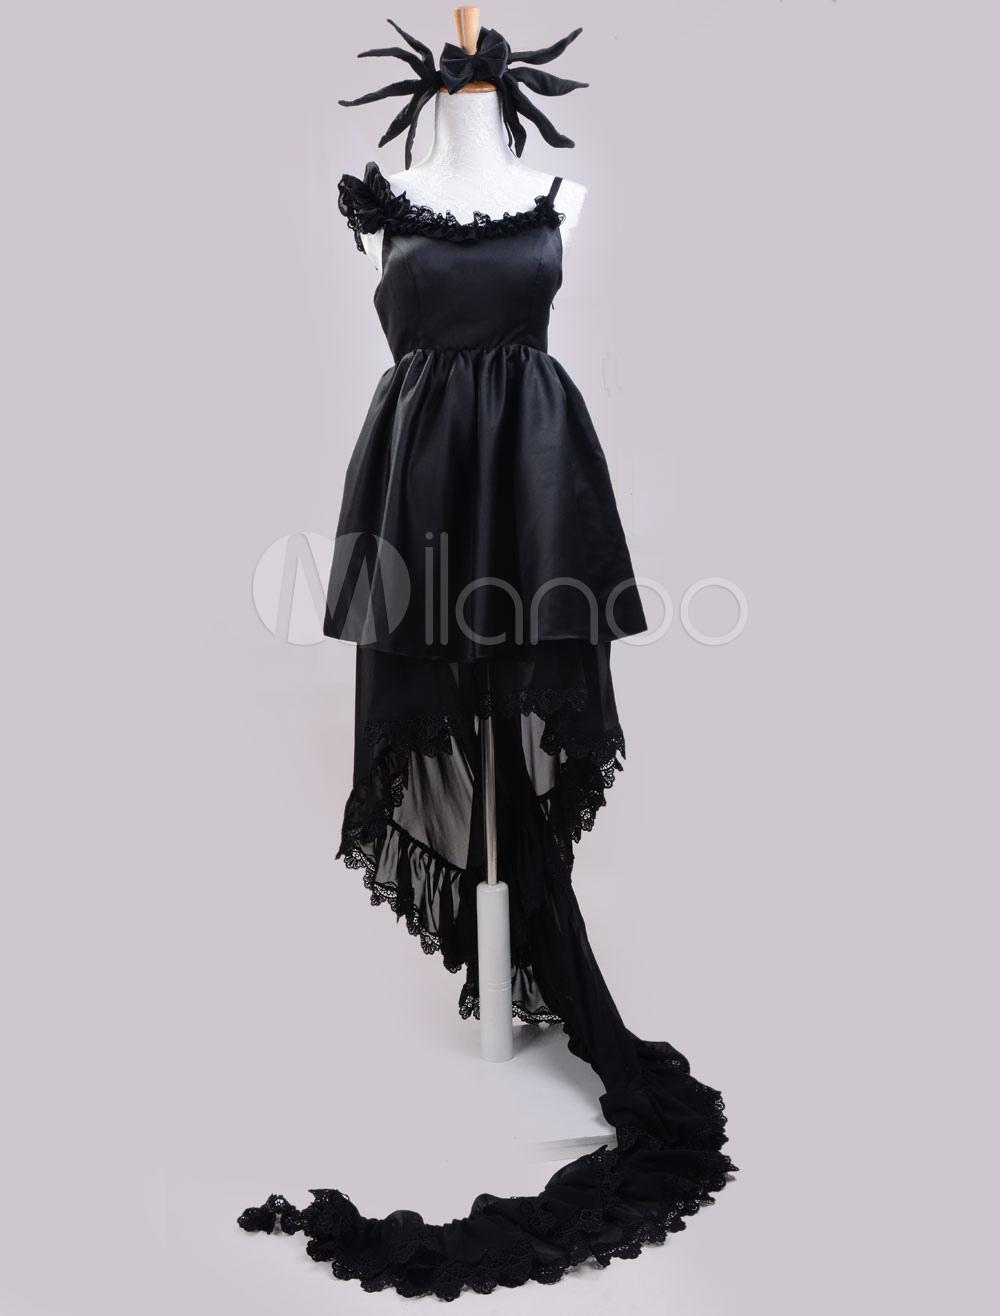 Vocaloid Hatsune Miku Halloween Cosplay Costume Deepsea Girl Version Black Lolita Dress Halloween